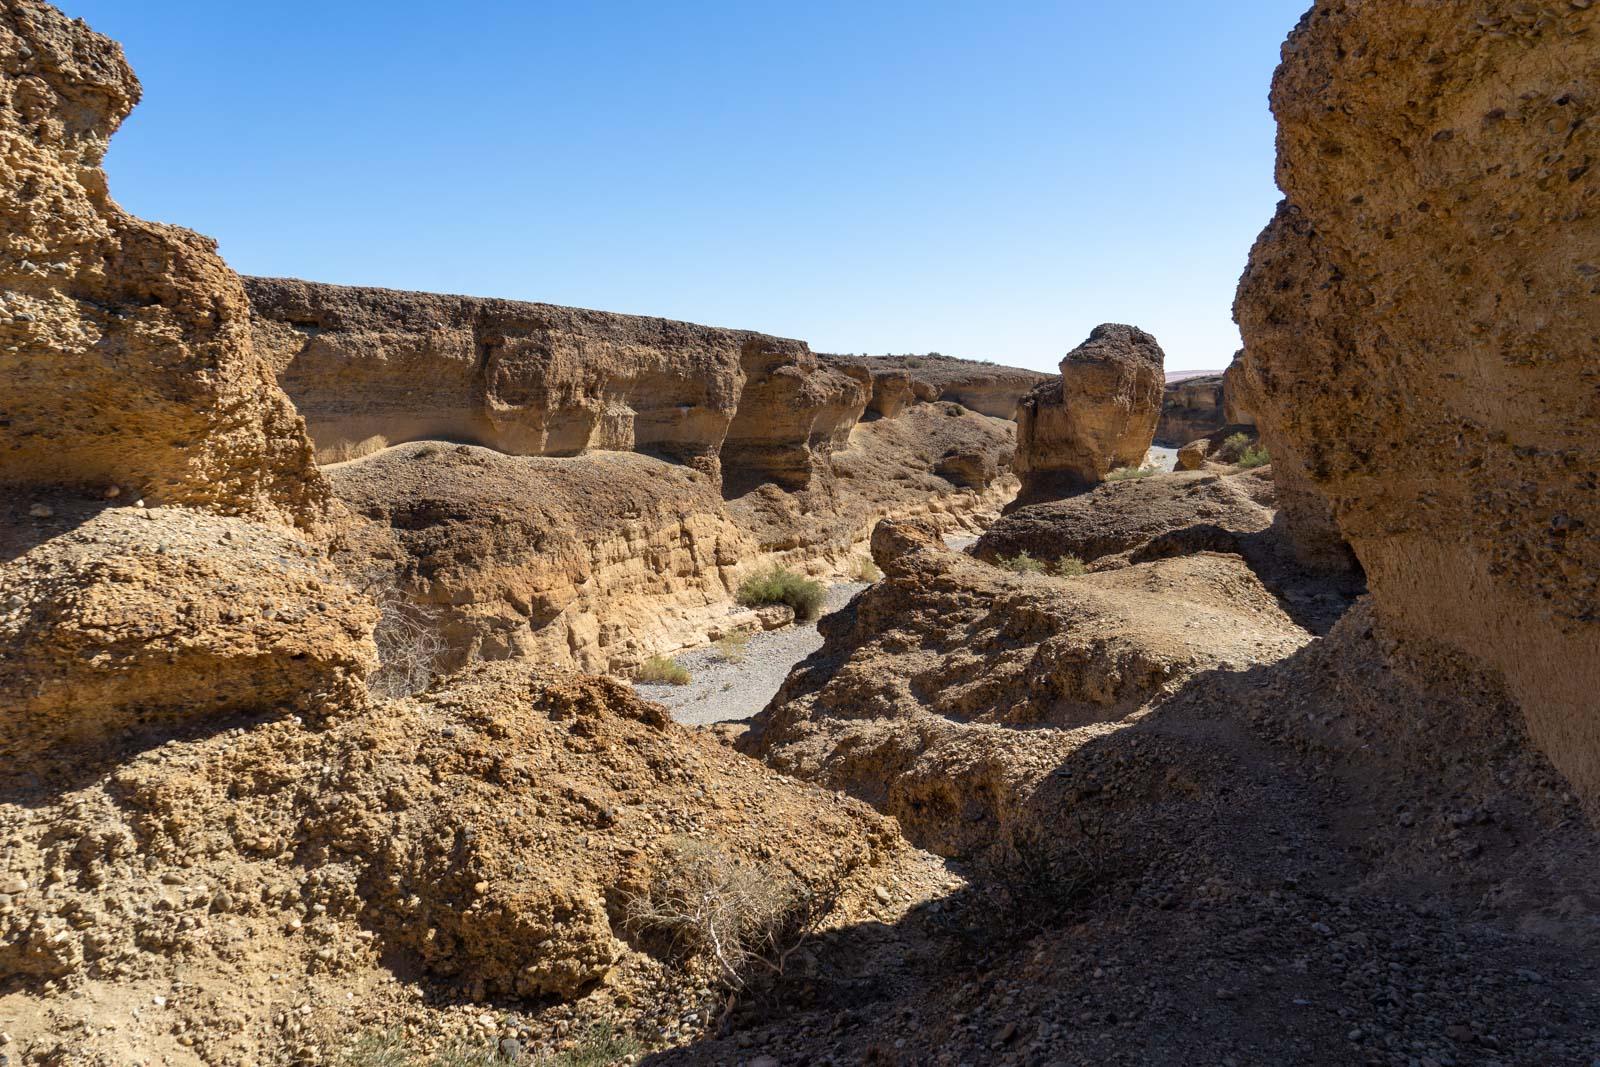 Sesriem Canyon, Sossusvlei, Namibia